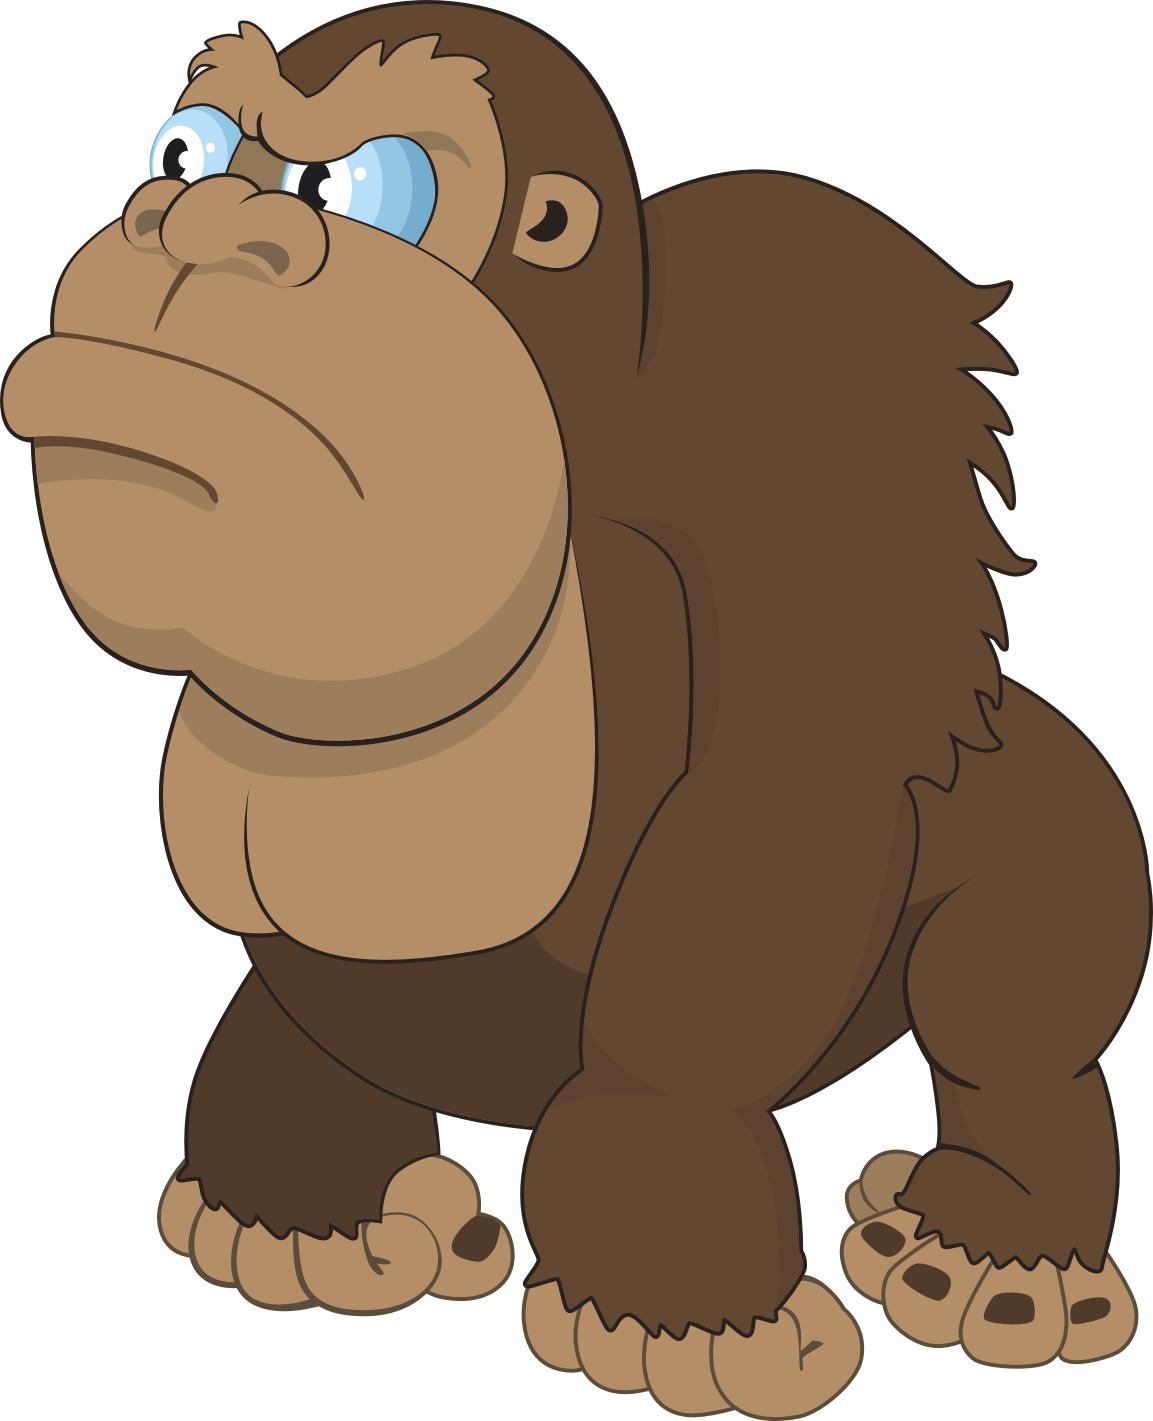 image royalty free library Ape clipart king kong. Gorilla cartoon drawing transprent